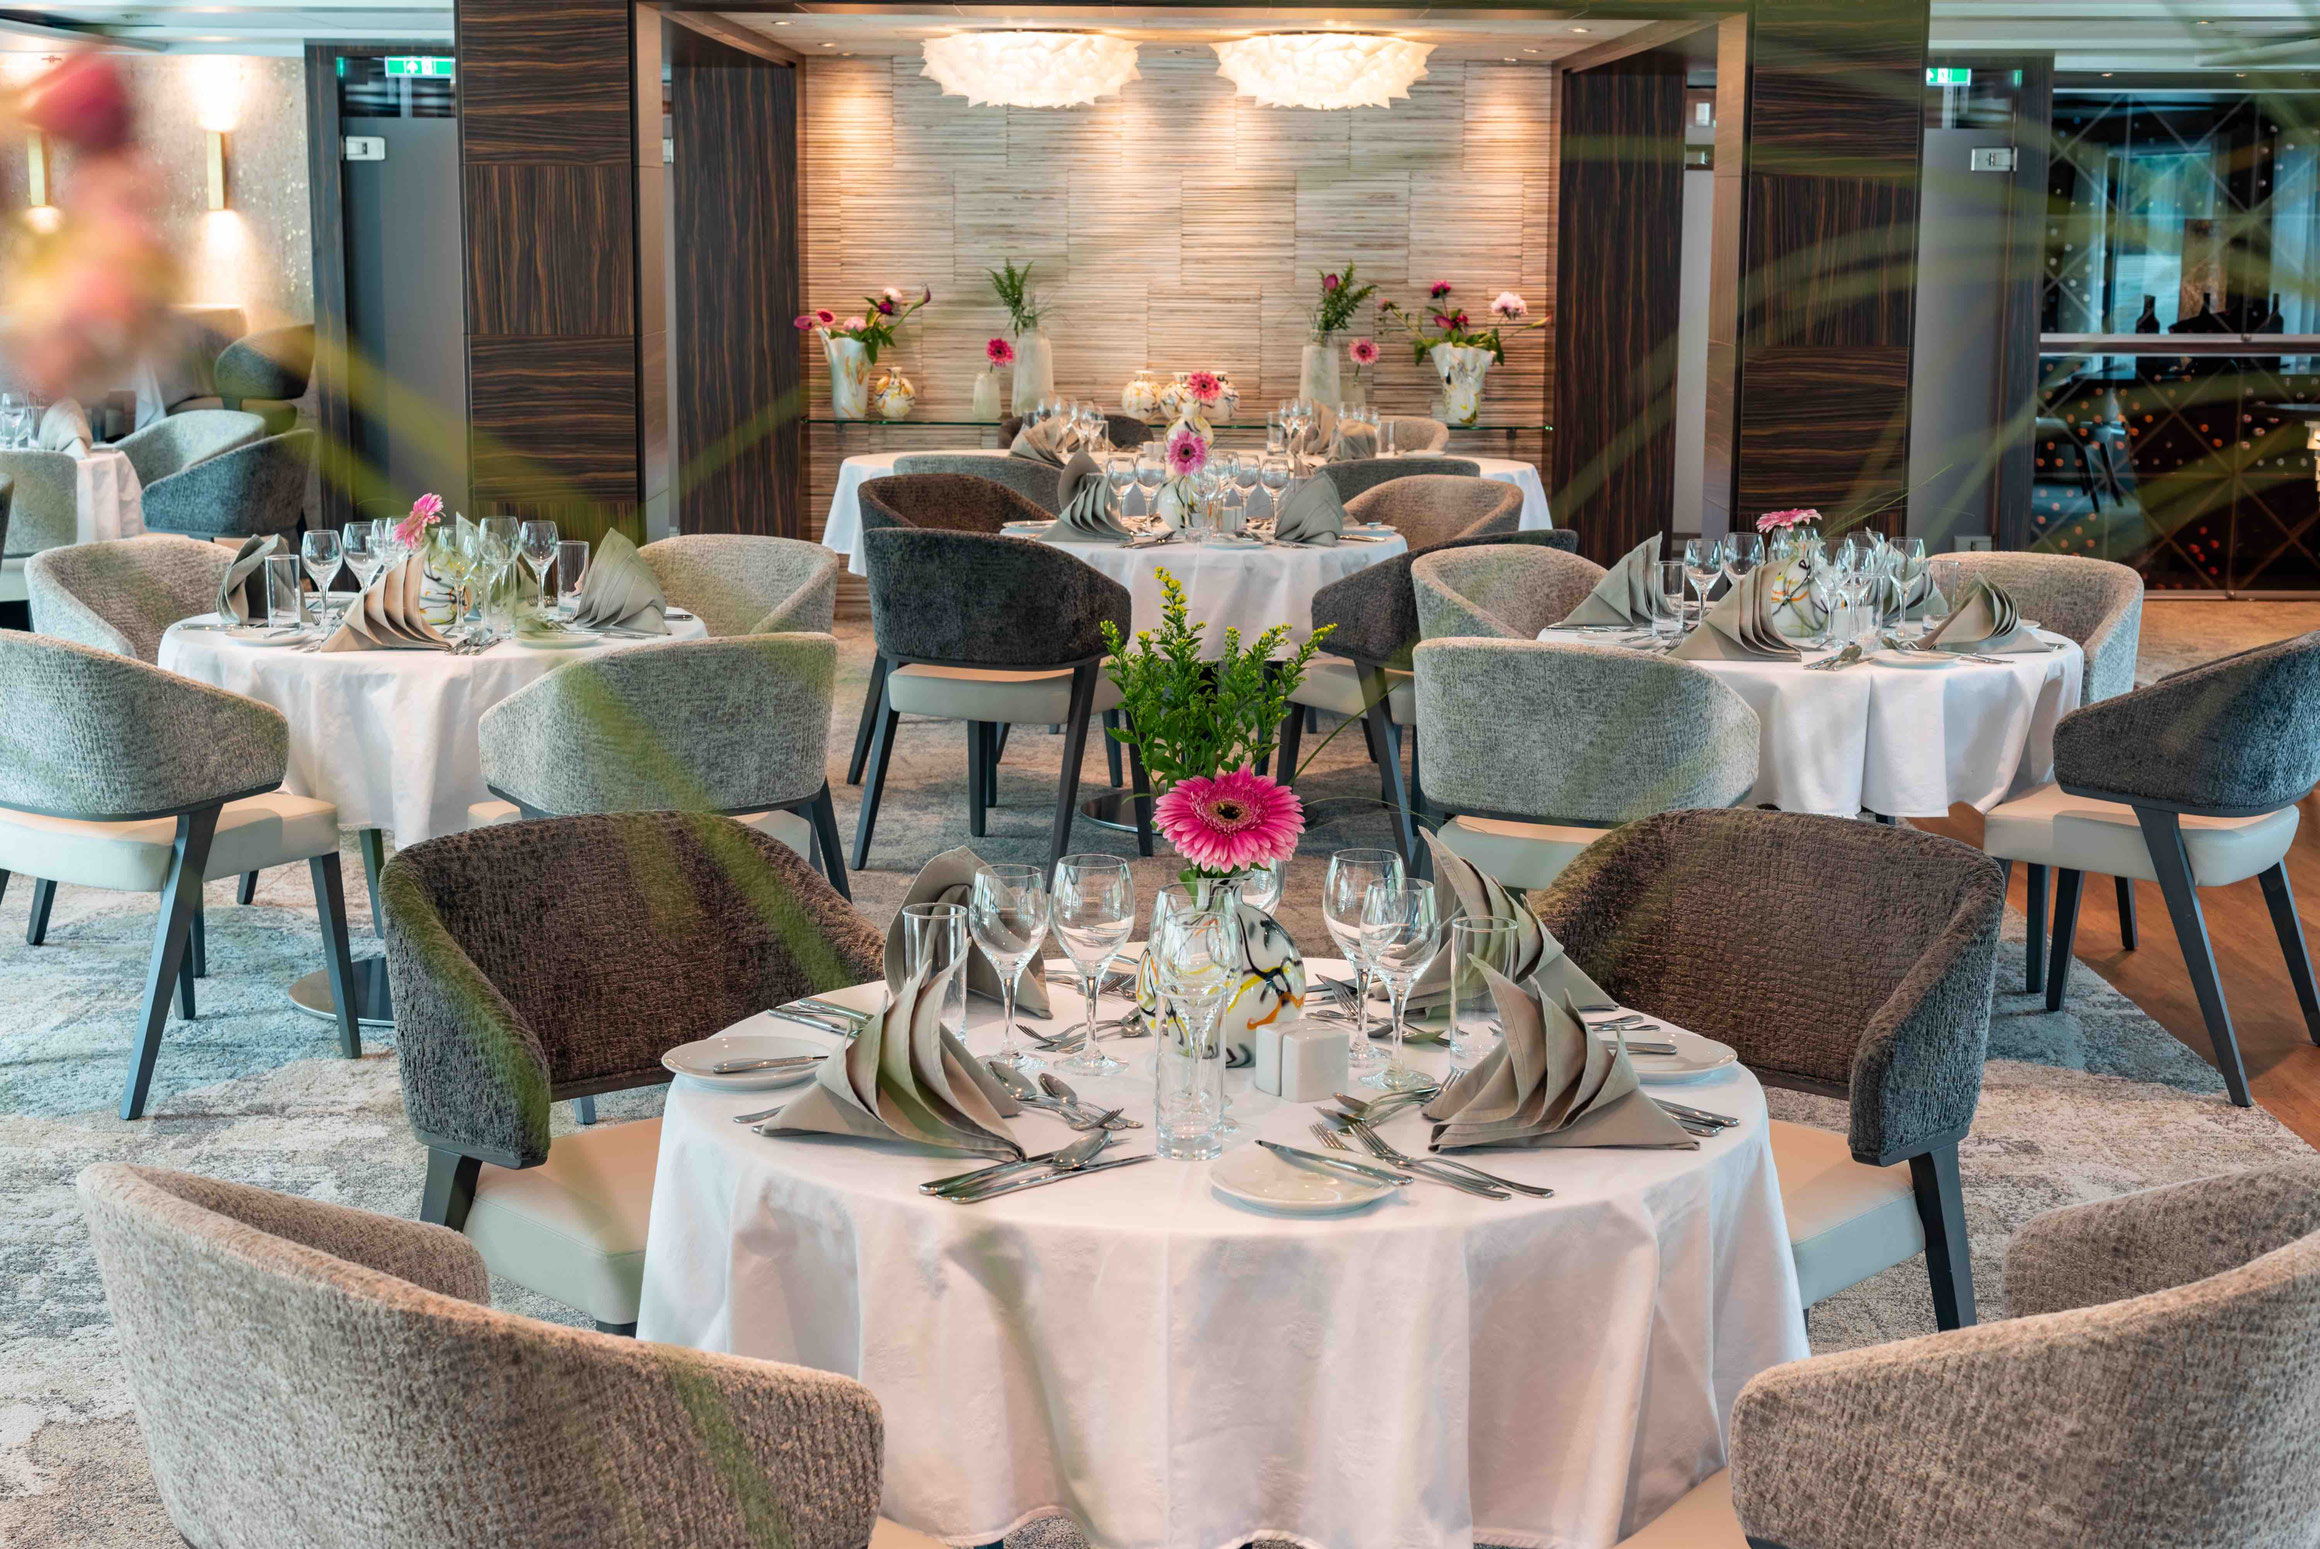 AMADEUS Star Panorama-Restaurant